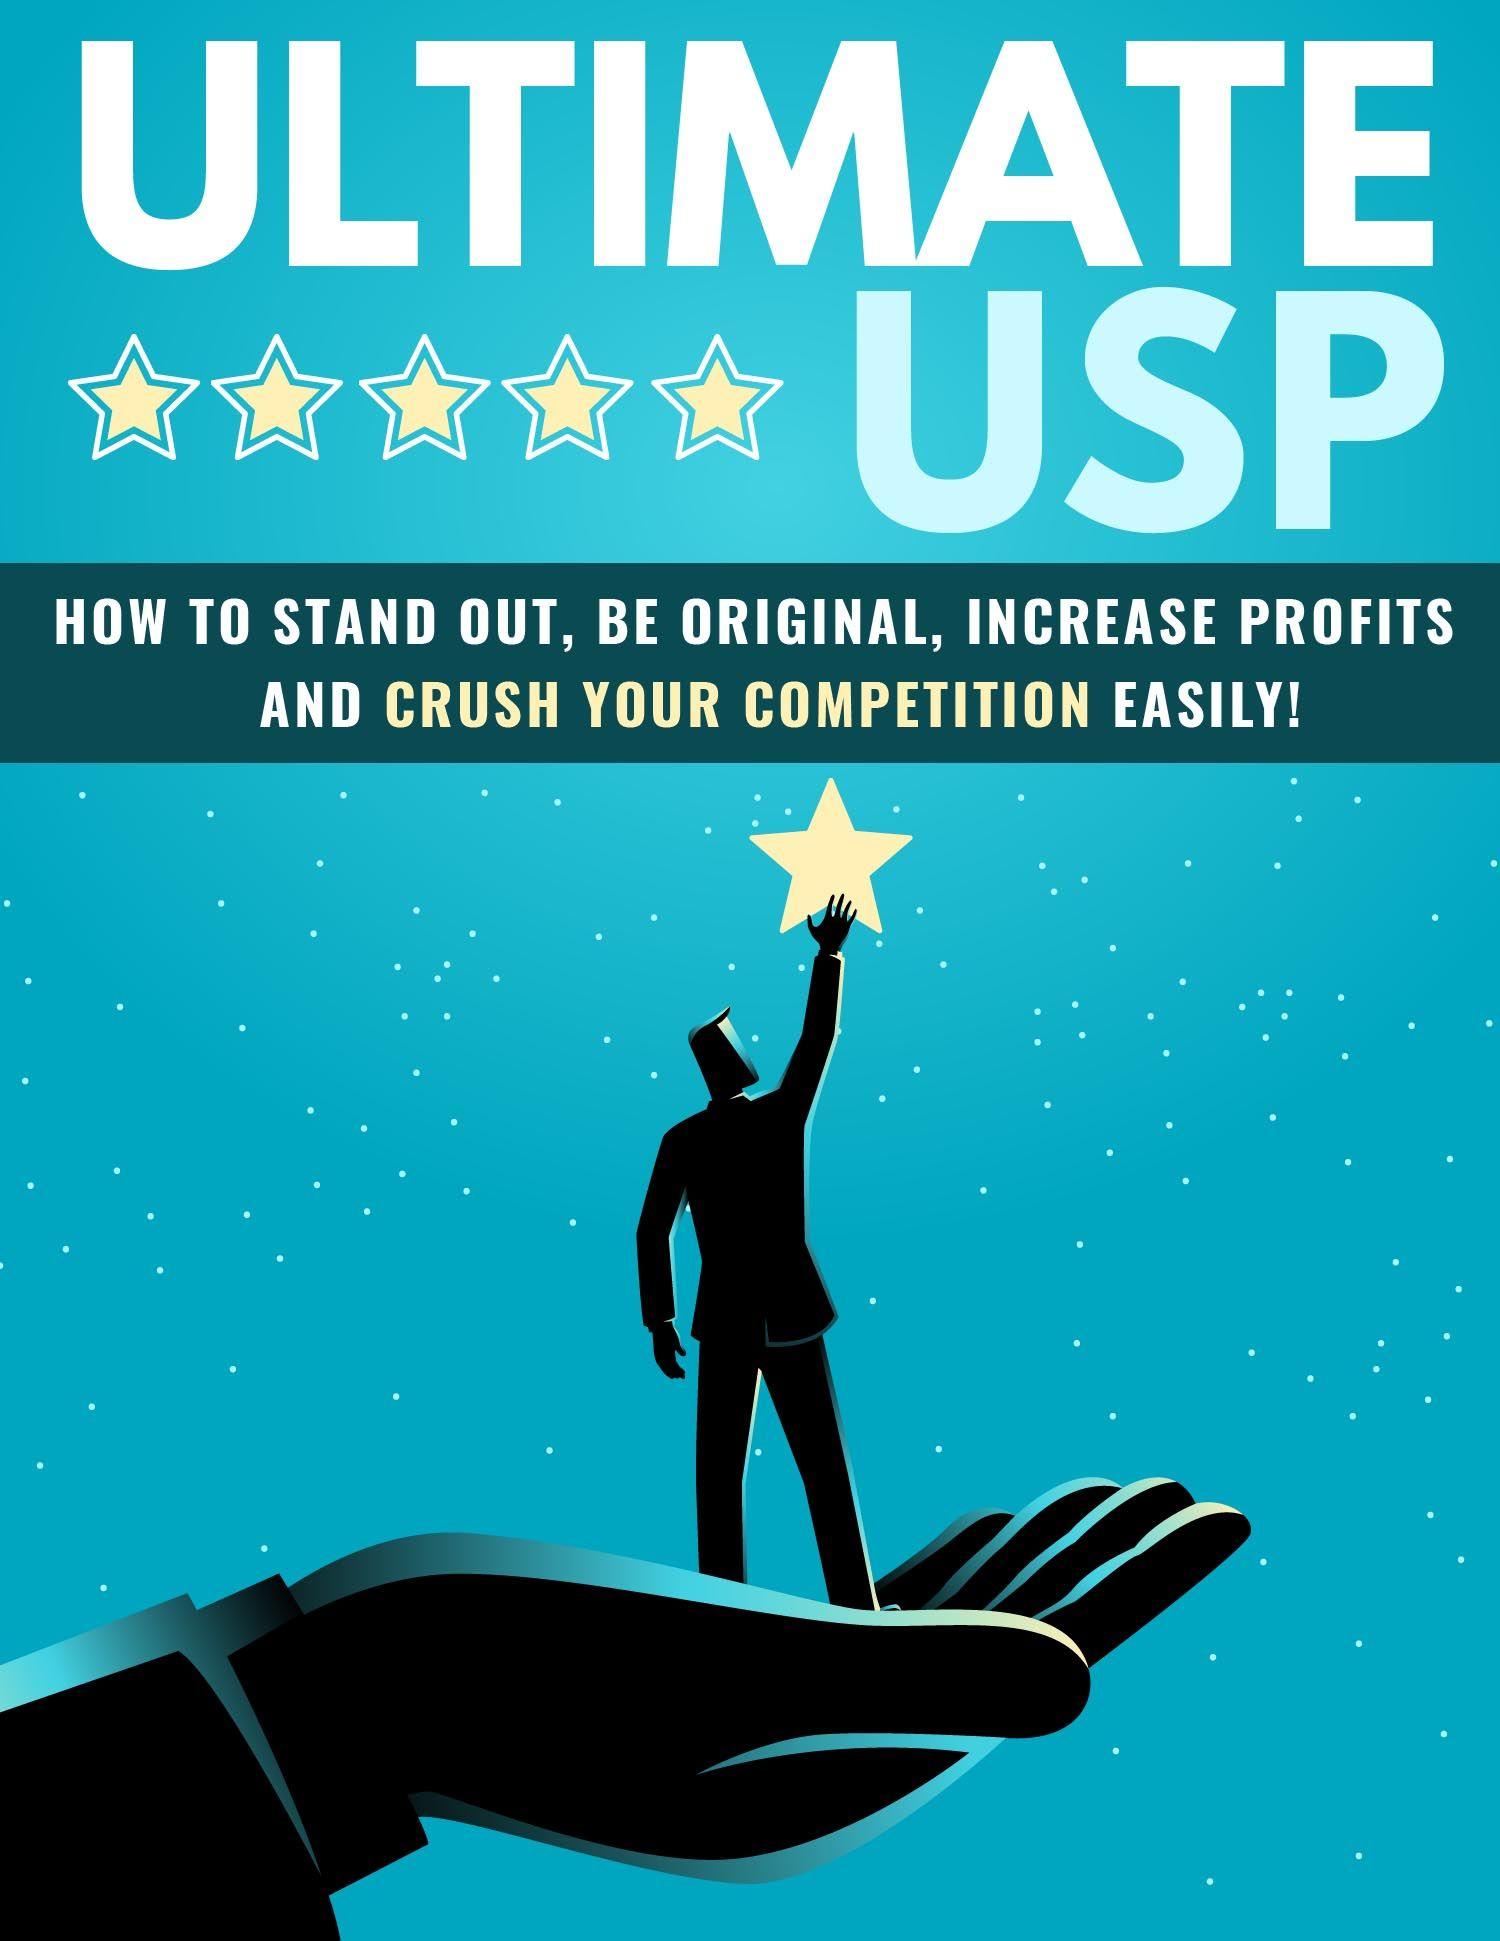 Ultimate USP (Unique Selling Proposition) eBook's Book Image